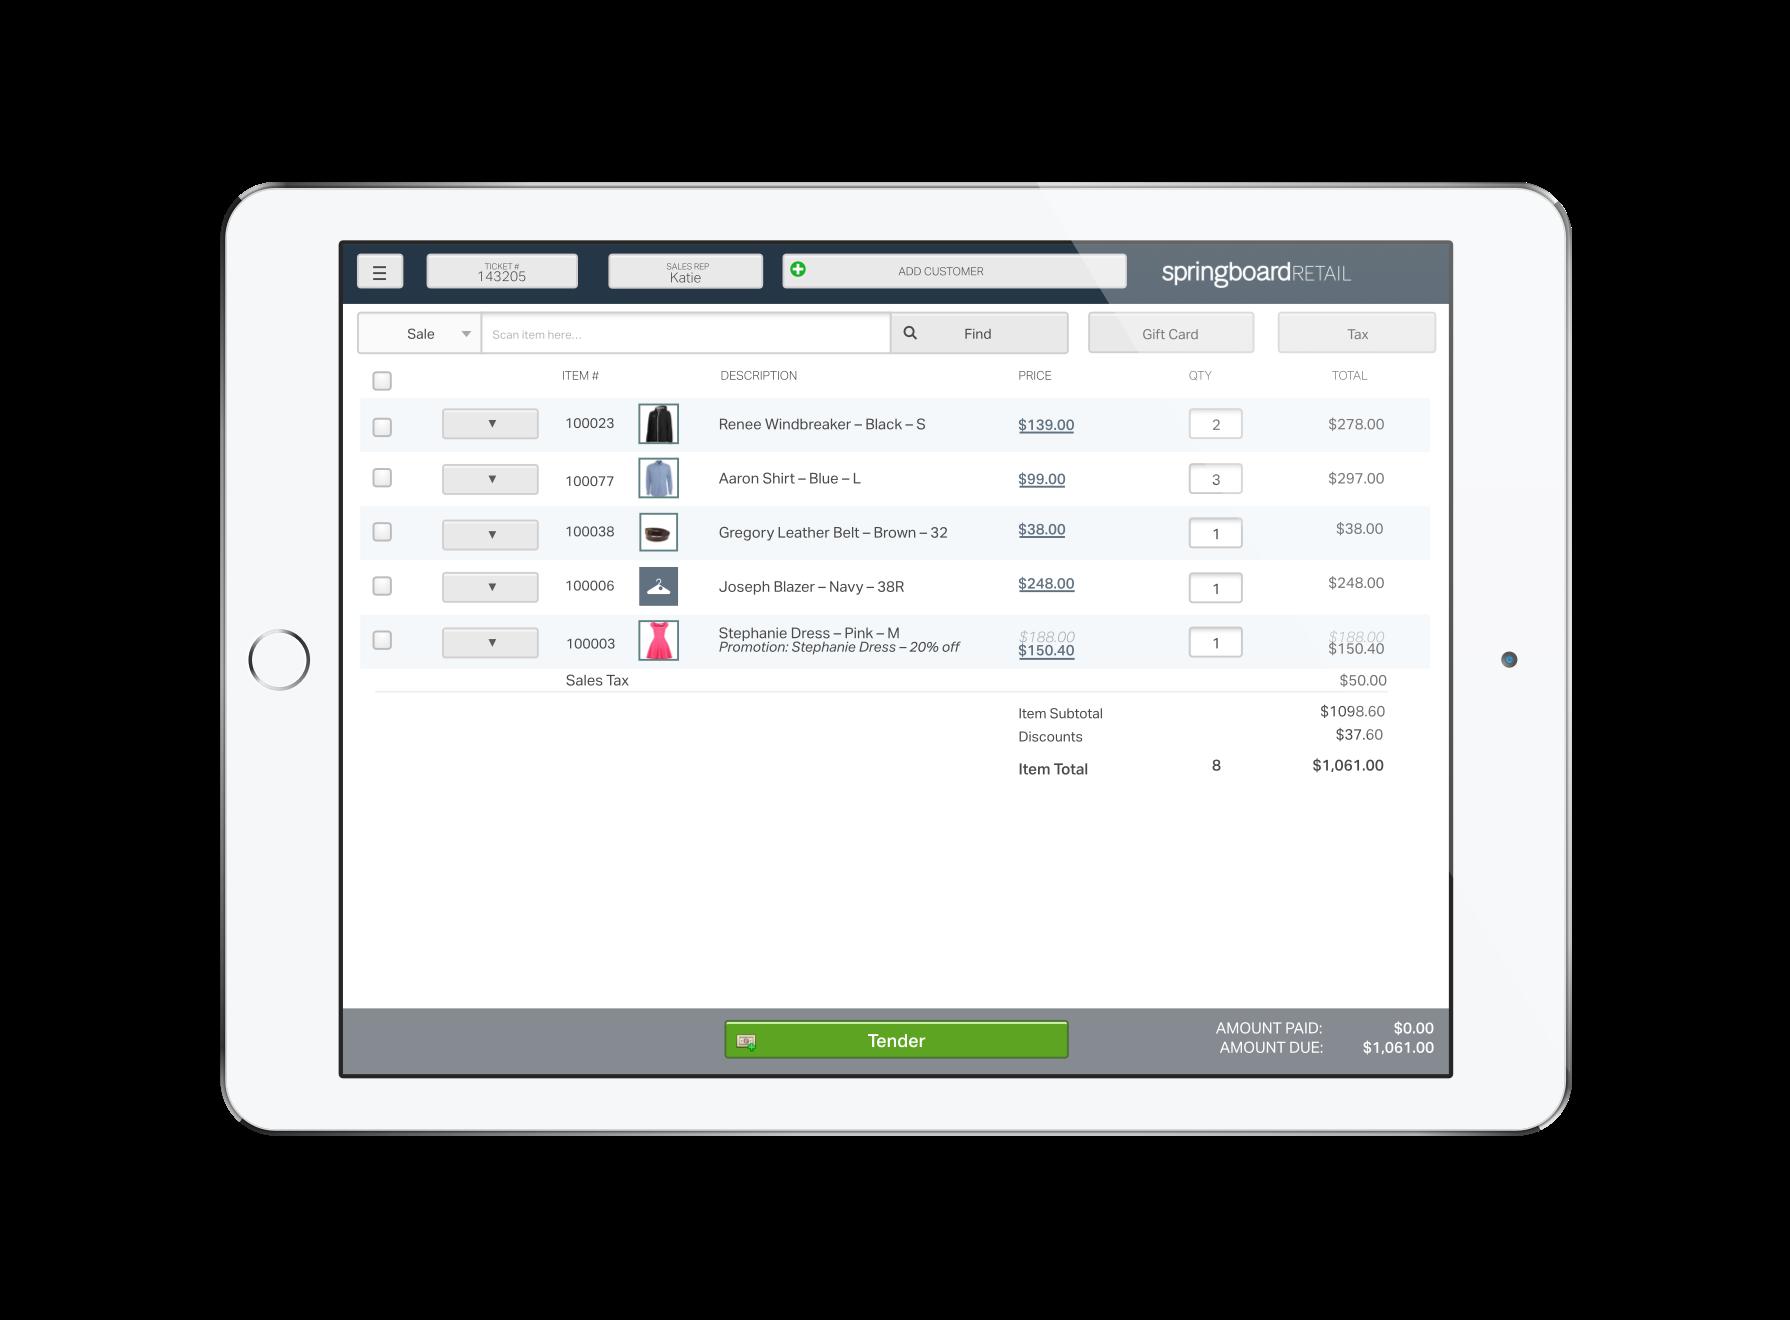 Springboard Retail Demo - Springboard Retail POS